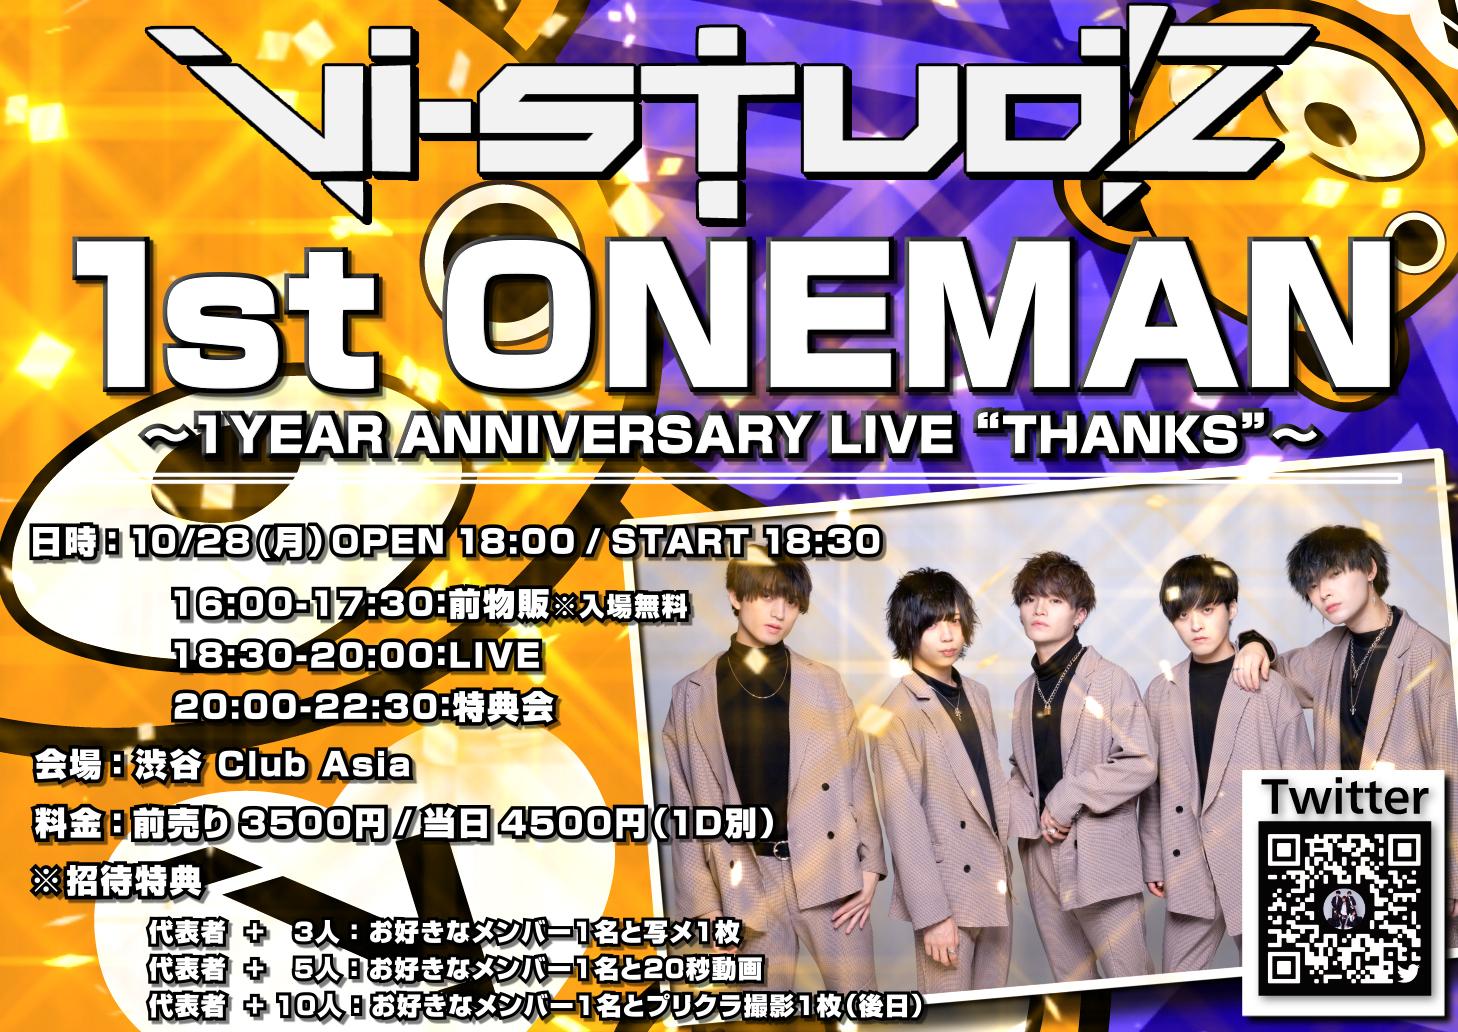 "Vi-Stud'Z 1st ONEMAN ~1YEAR ANNIVERSARY LIVE ""THANKS"" 〜"